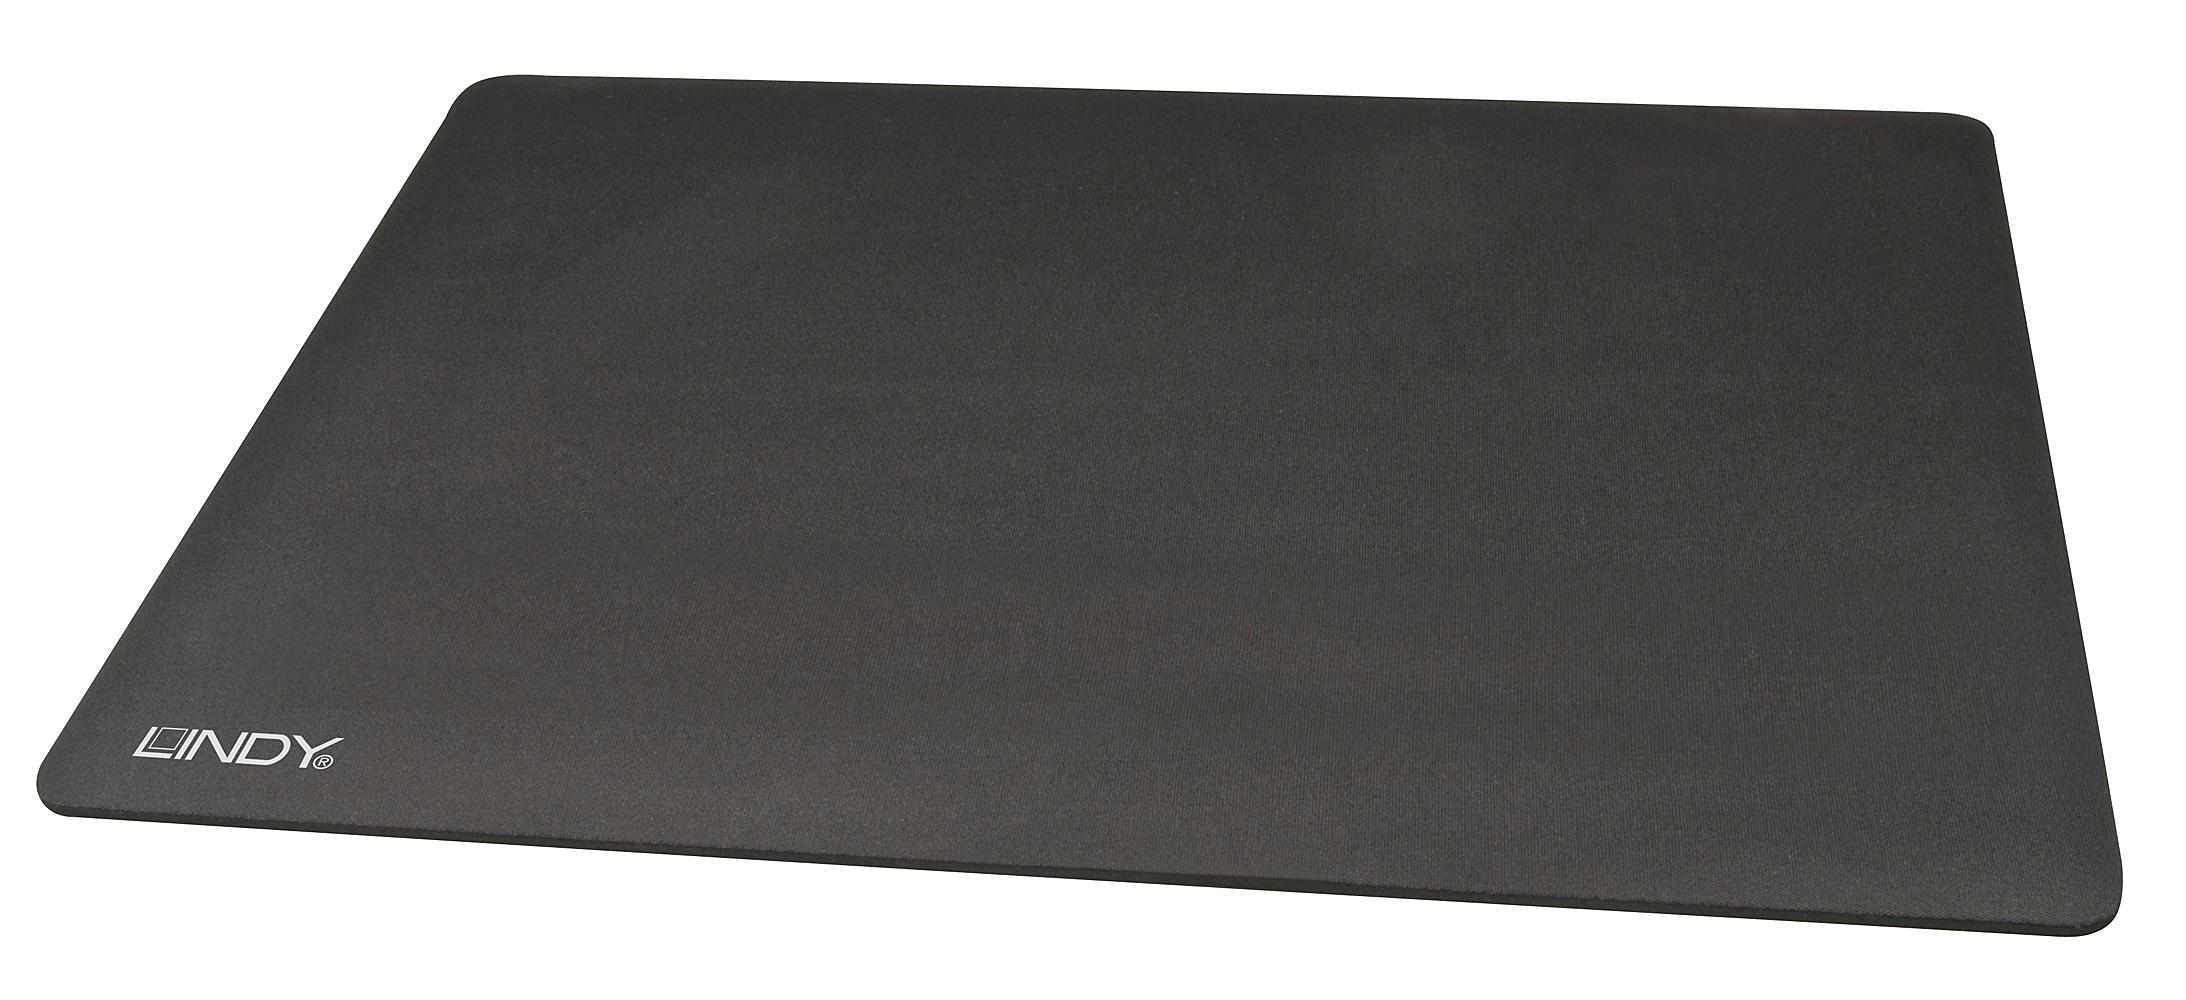 Mausmatte - Mousepad Professional XXL 45 x 35mm